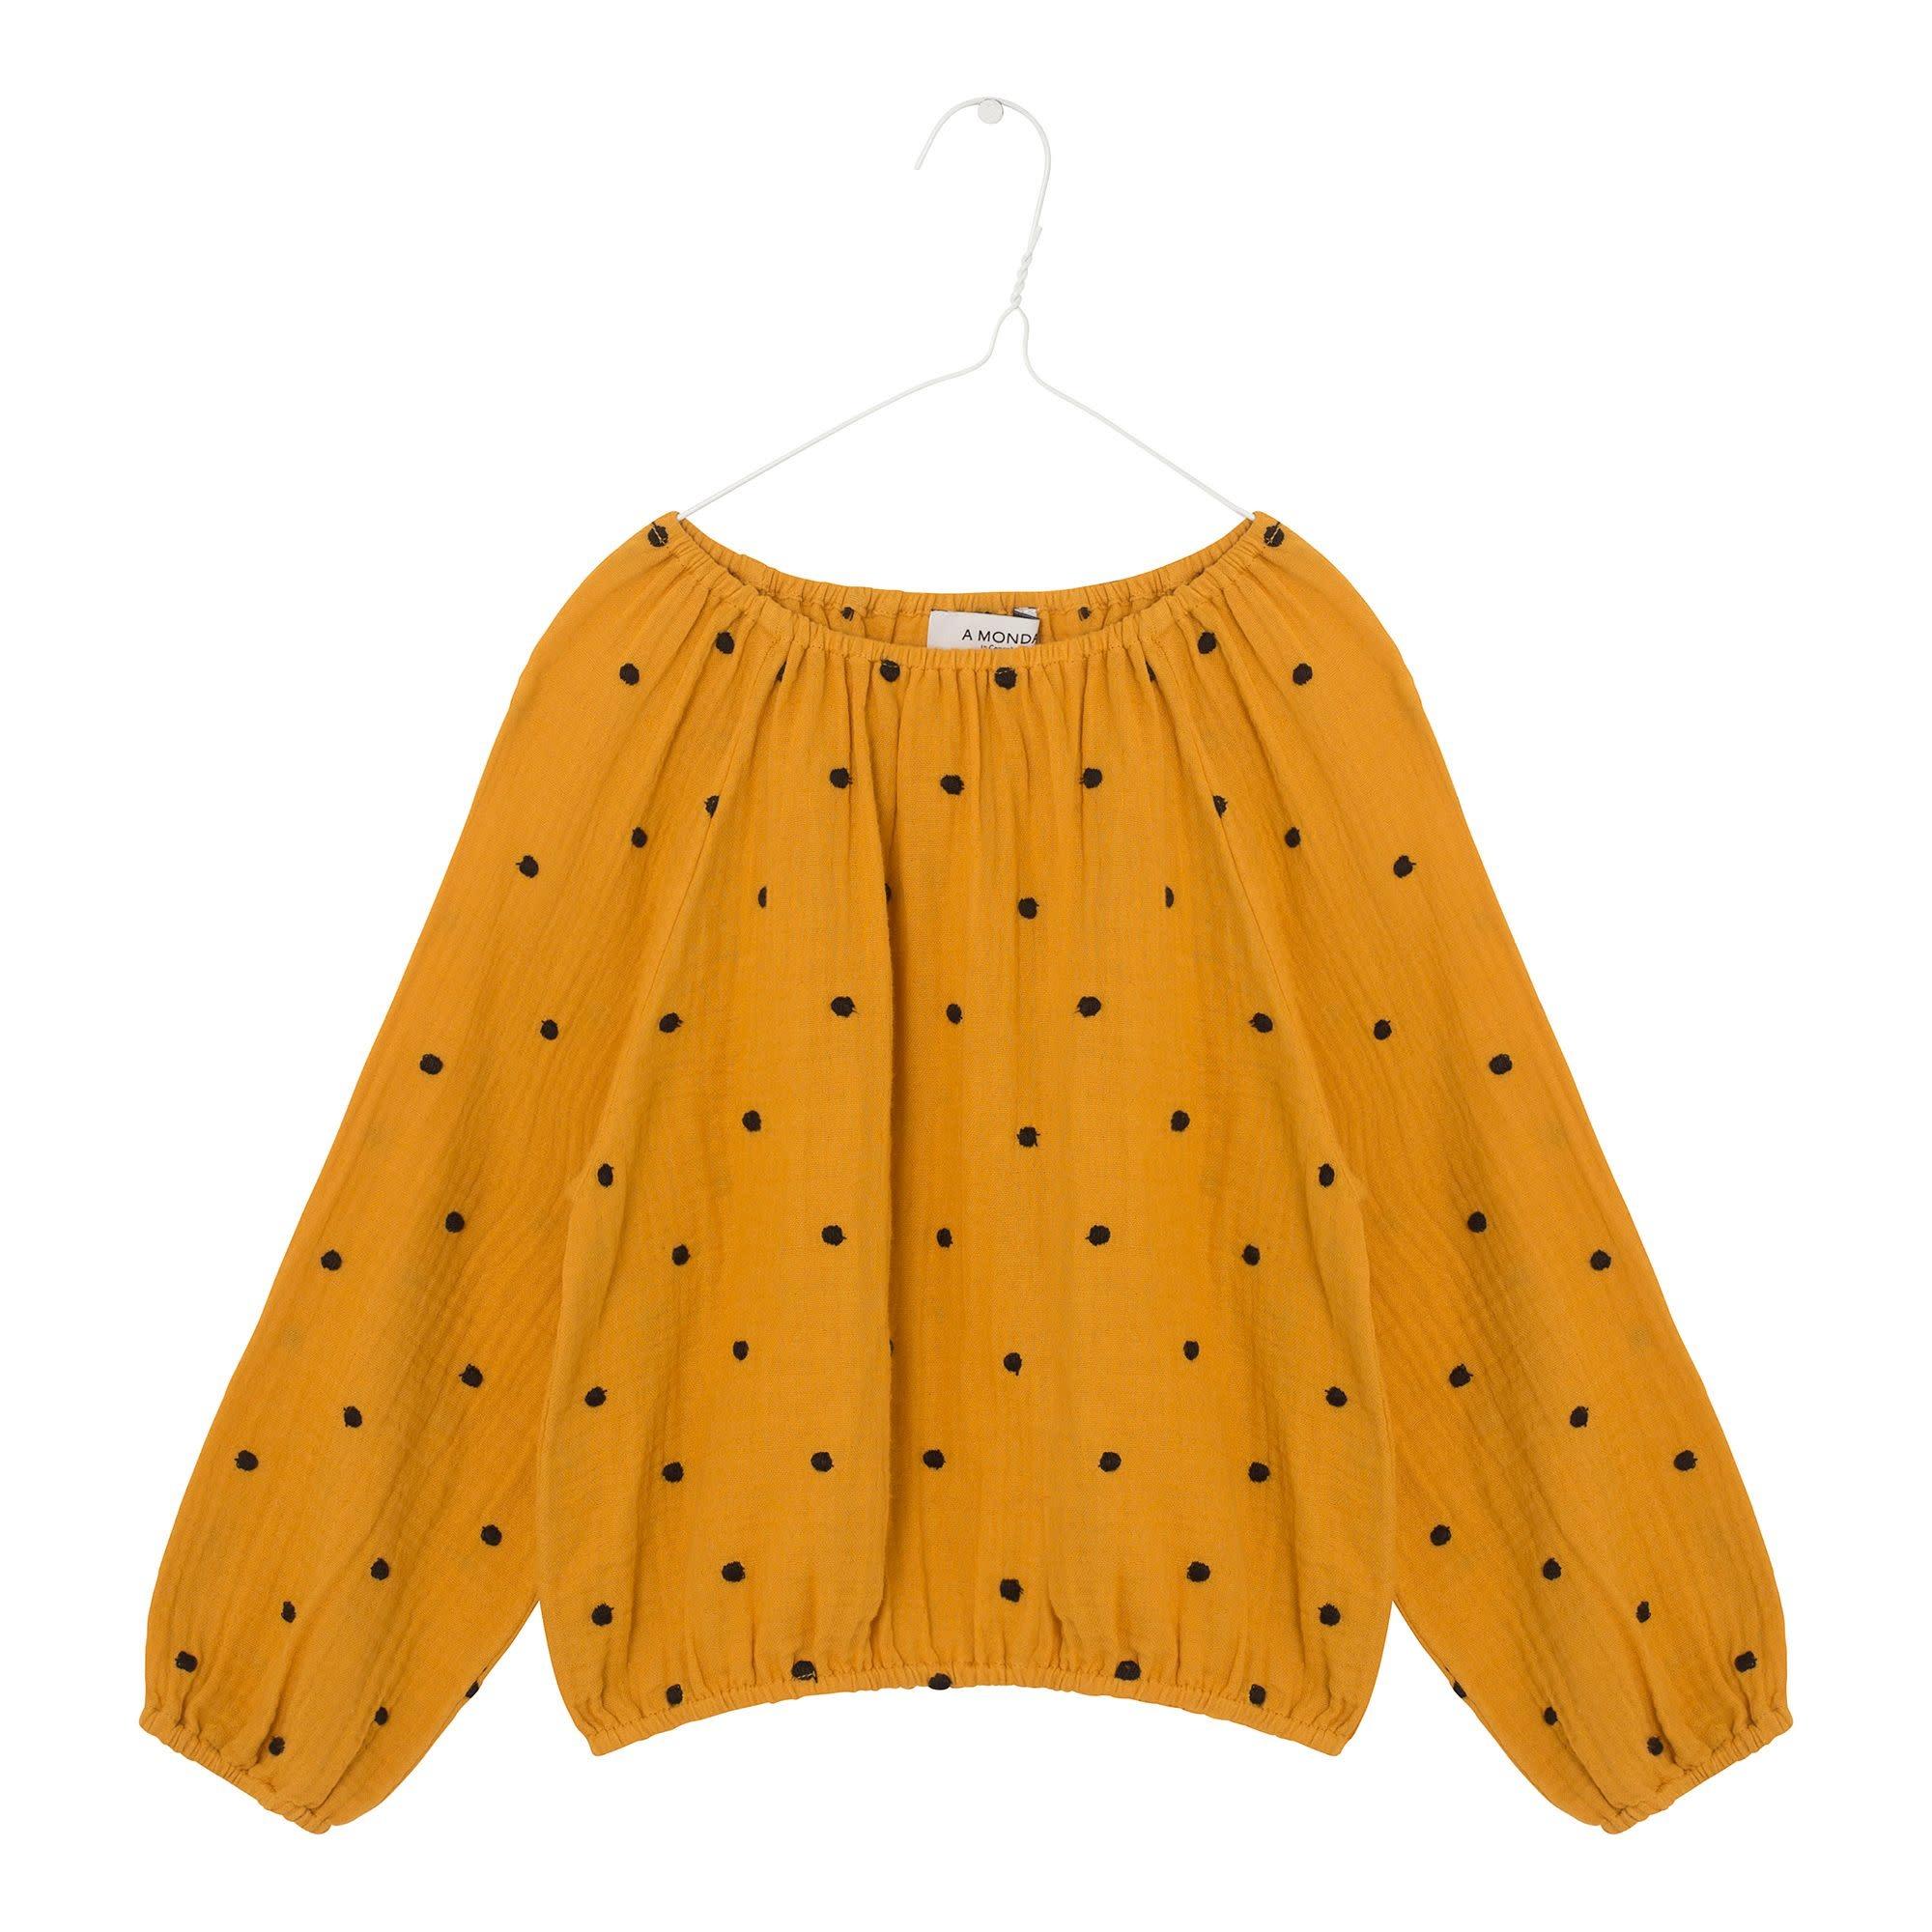 A Monday A monday - Didi blouse golden yellow